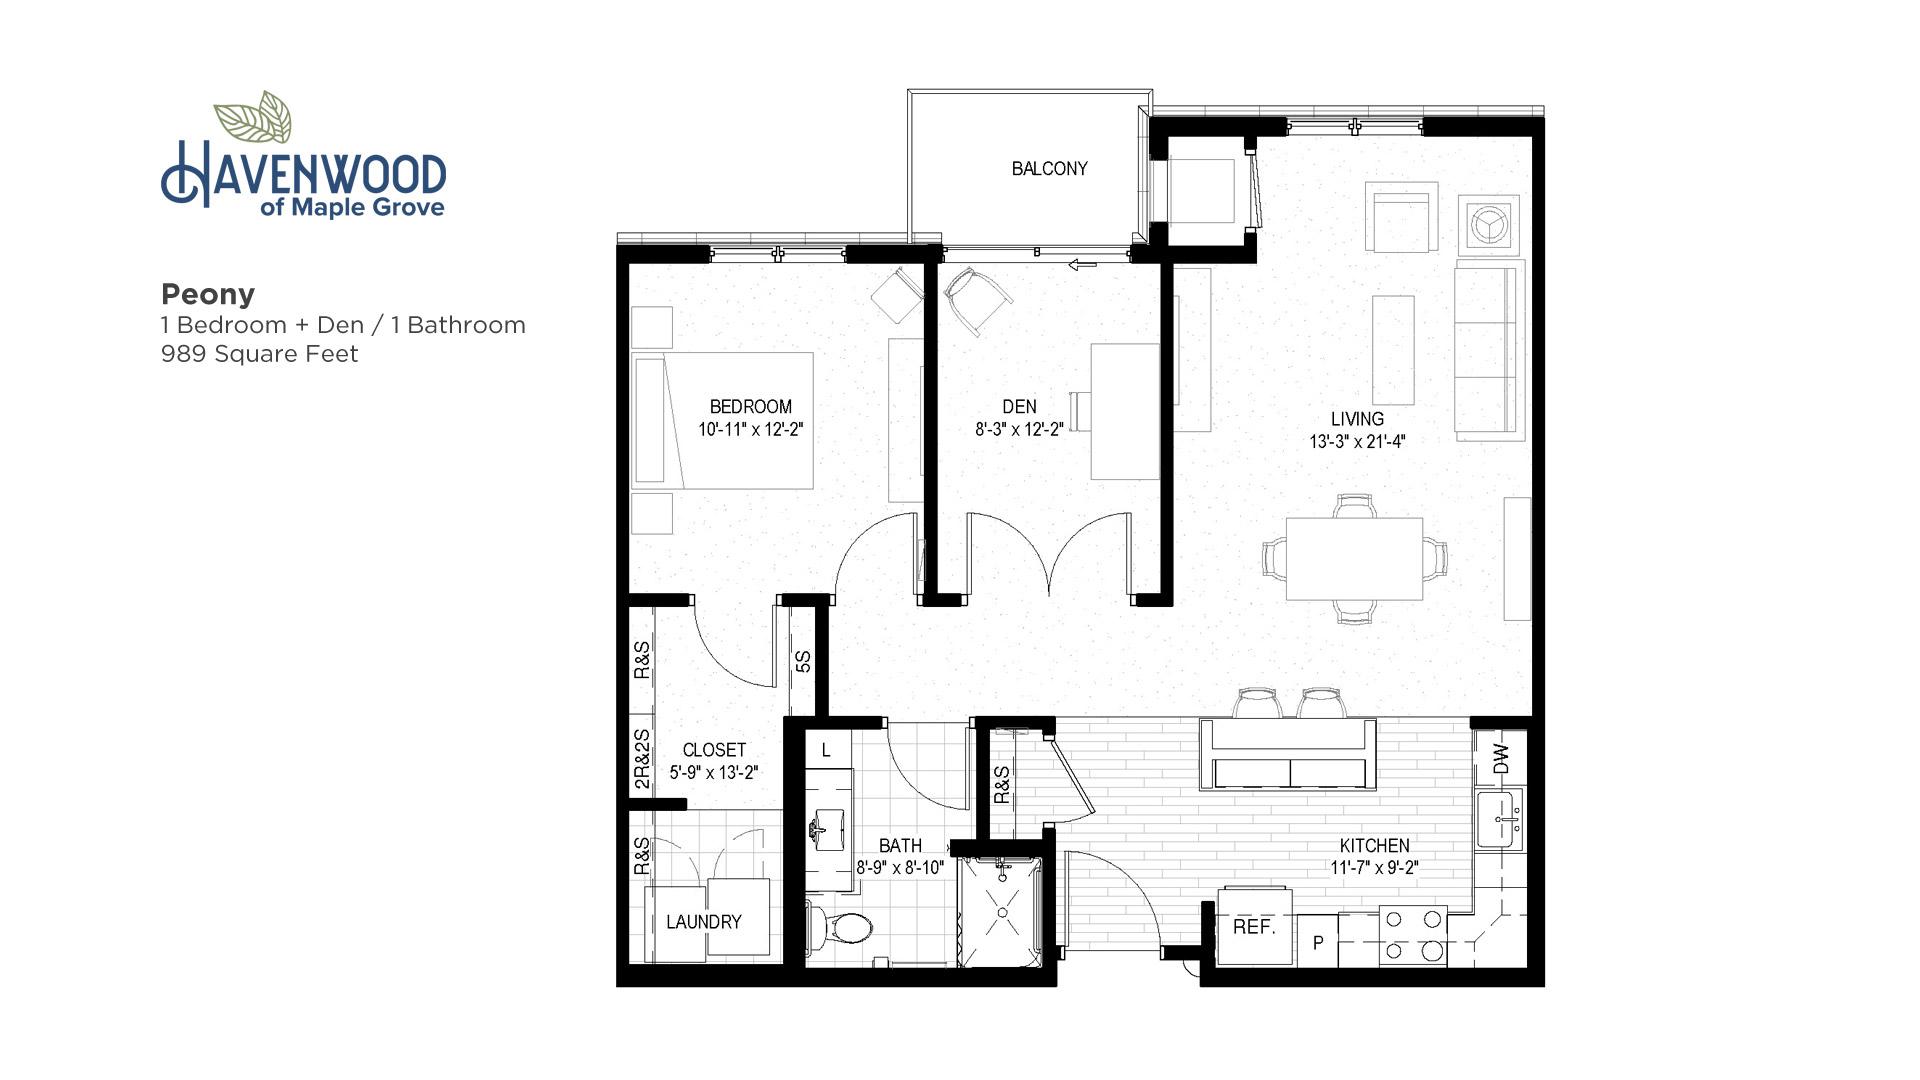 Havenwood of Maple Grove Peony Floor Plan